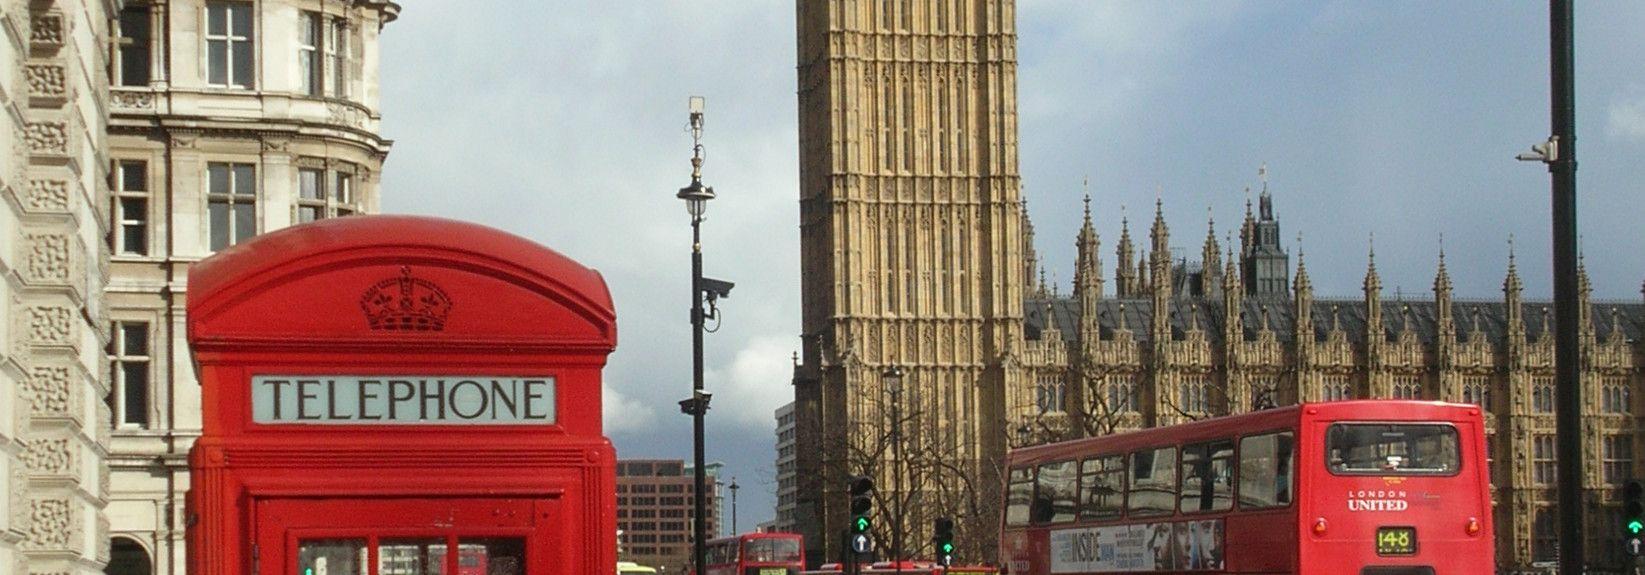 Bloomsbury, Londres, Inglaterra, Reino Unido